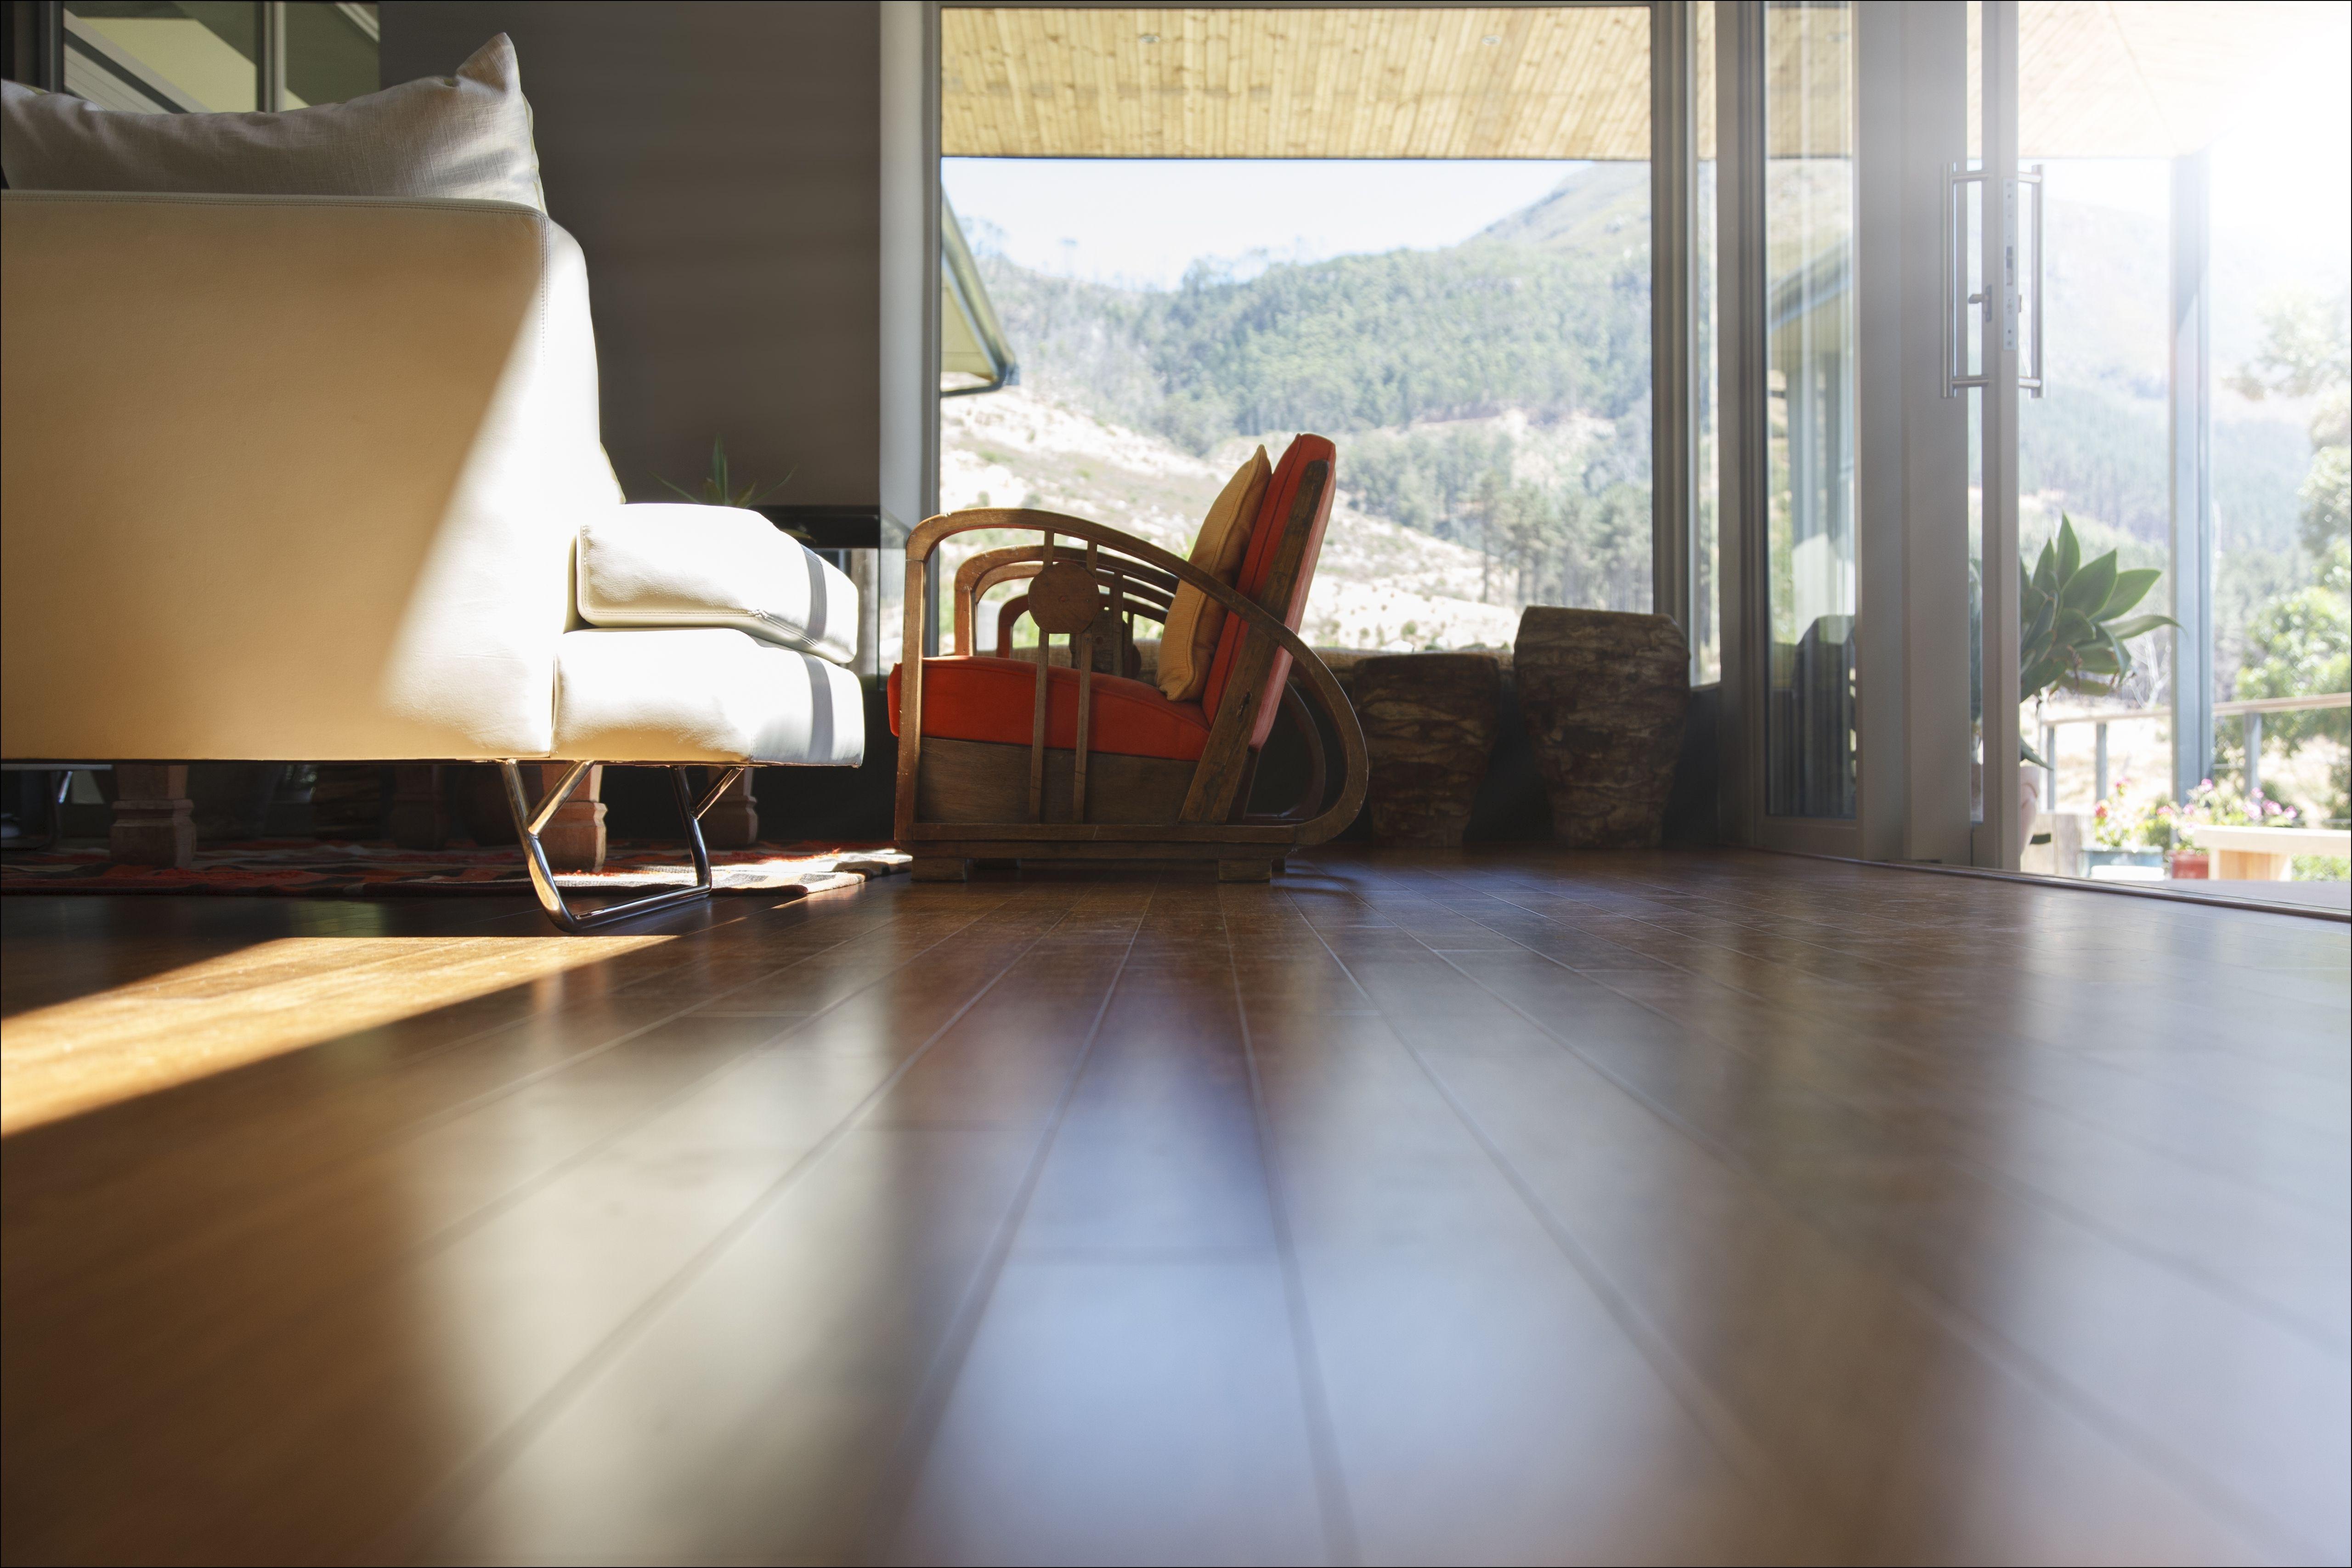 hallmark hardwood flooring reviews of laminate flooring installation flooring ideas pertaining to laminate flooring sales and installation stock vinyl plank flooring brands pros and cons and reviews of